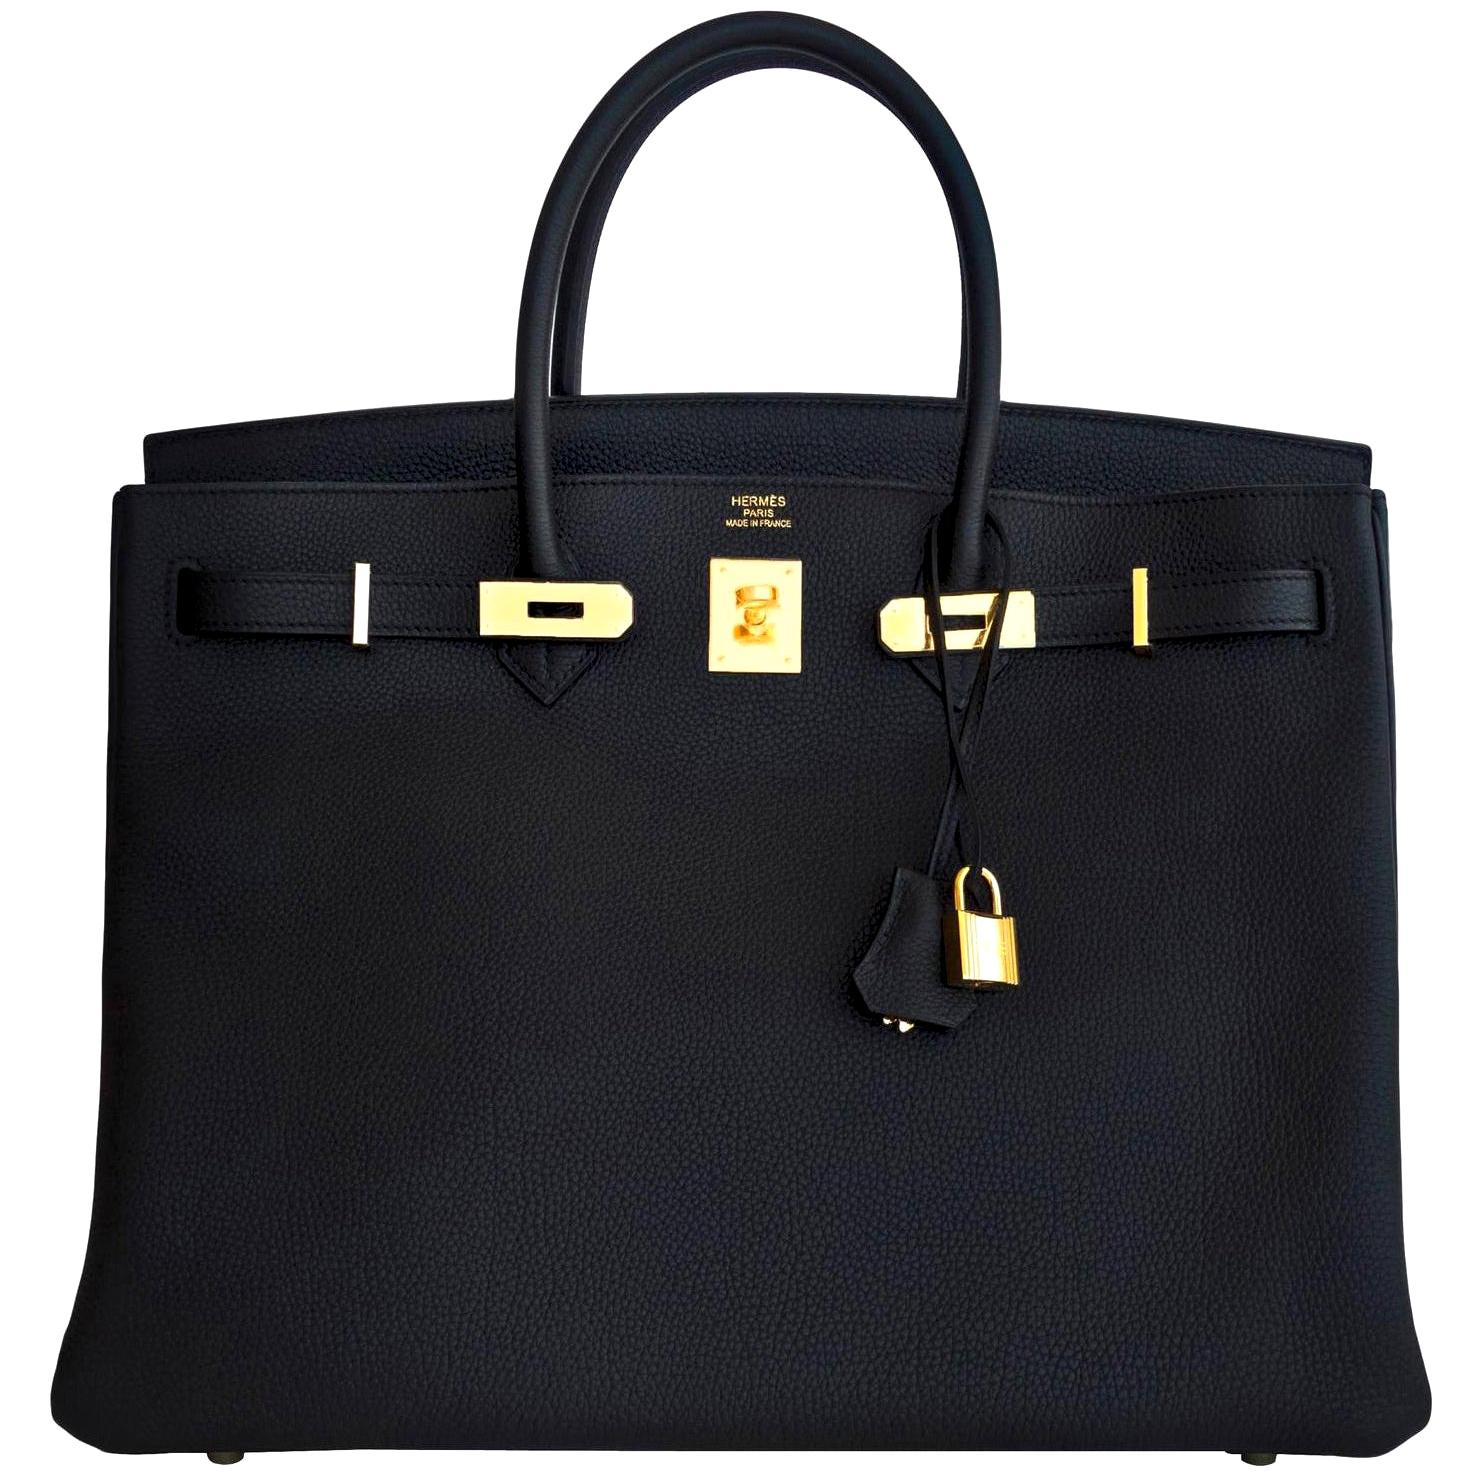 Hermes Birkin 40cm Black Togo Gold Power Birkin Bag NEW RARE